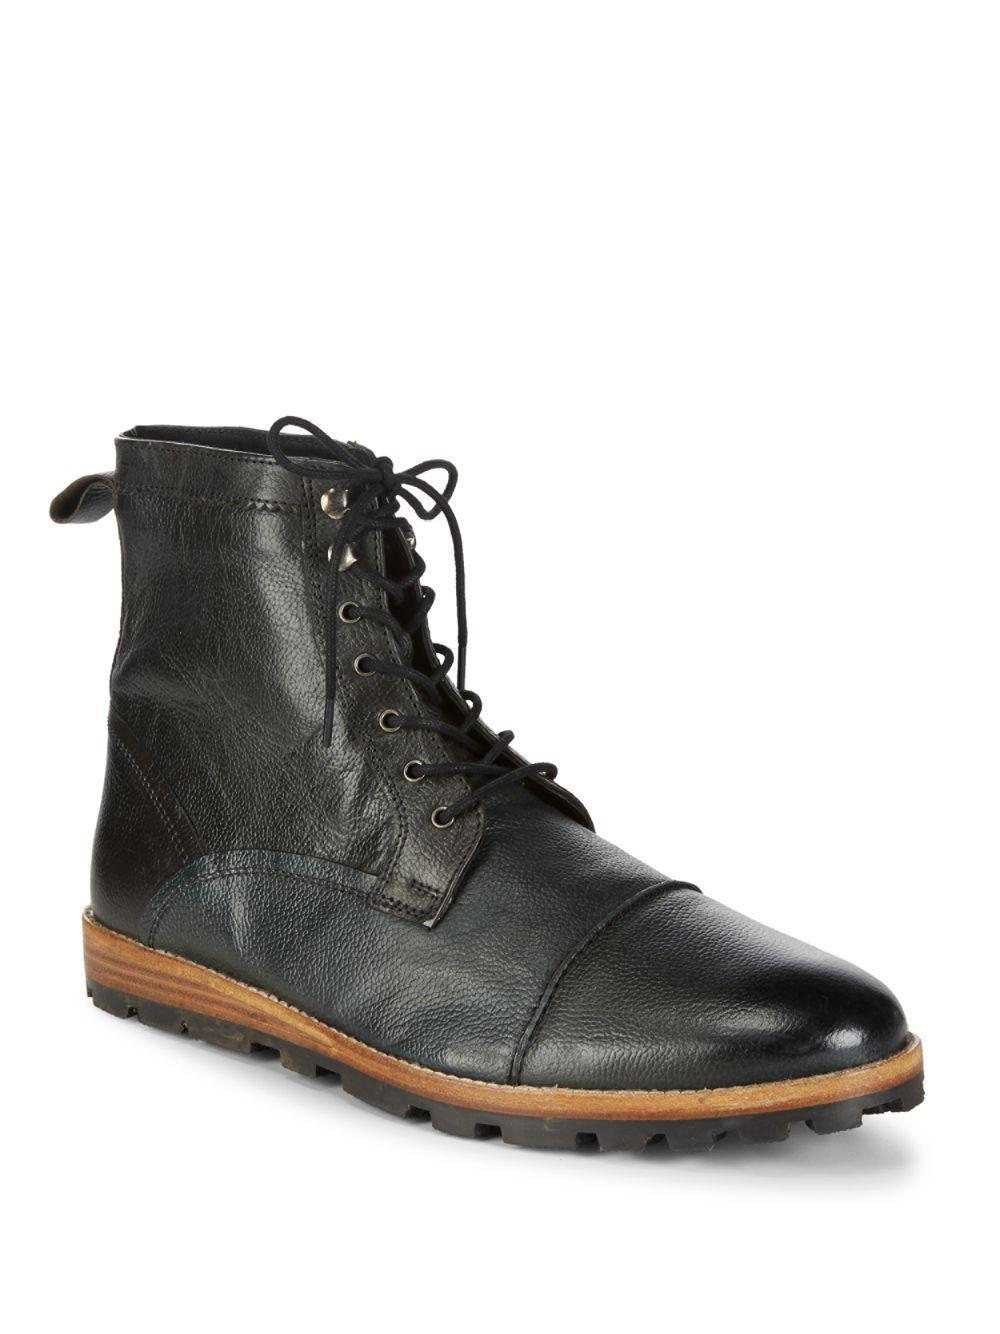 Andrew Tall Boot Ben Sherman wMZdi4K